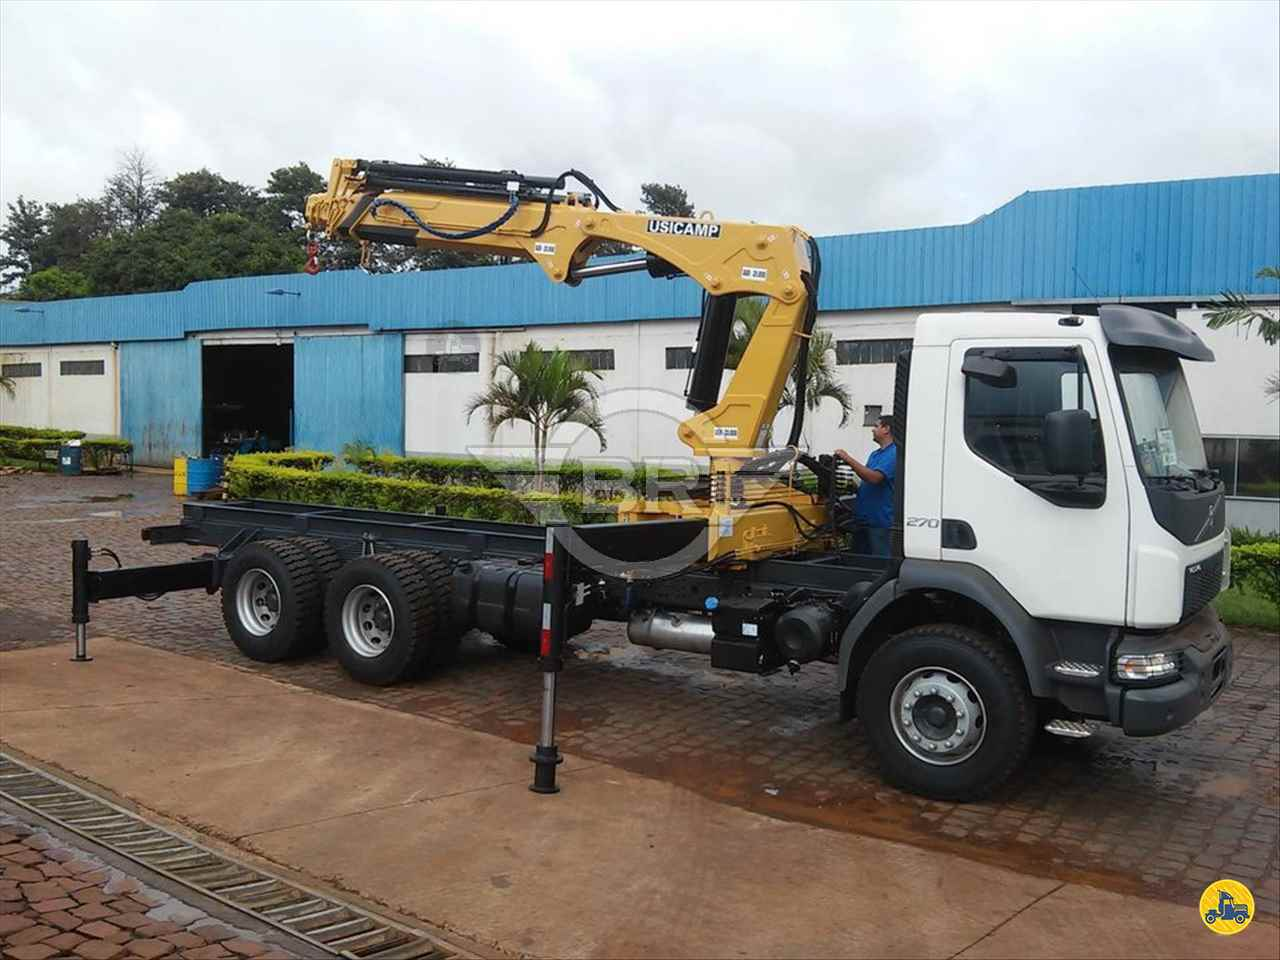 CAMINHAO VOLVO VOLVO VM 270 Guincho Munck Truck 6x2 Renovadora BR Frotas SAO PAULO SÃO PAULO SP